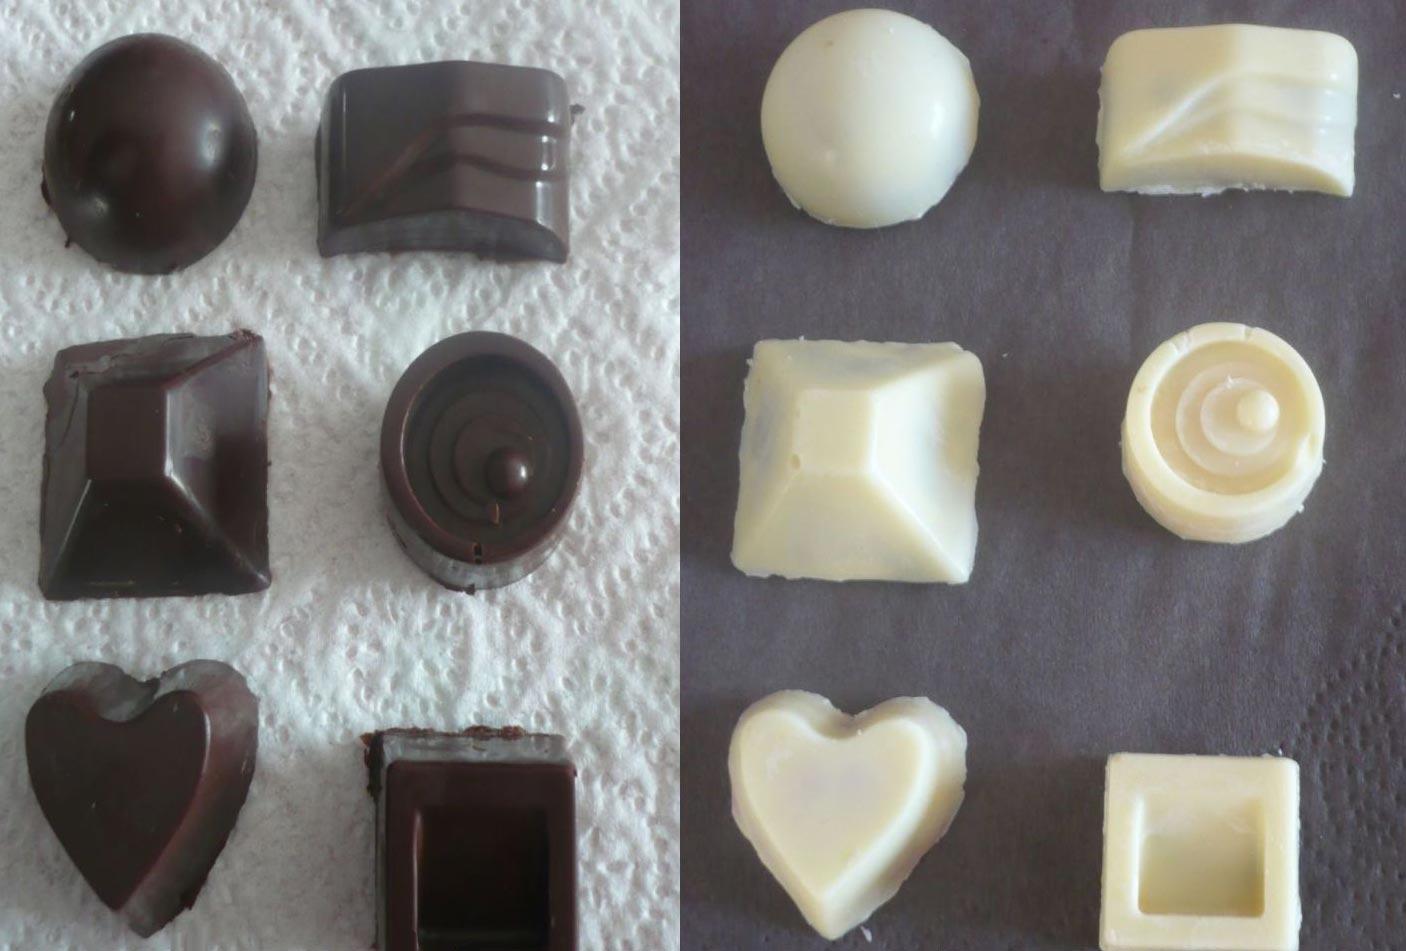 Bonbons au chocolat blanc ou noir